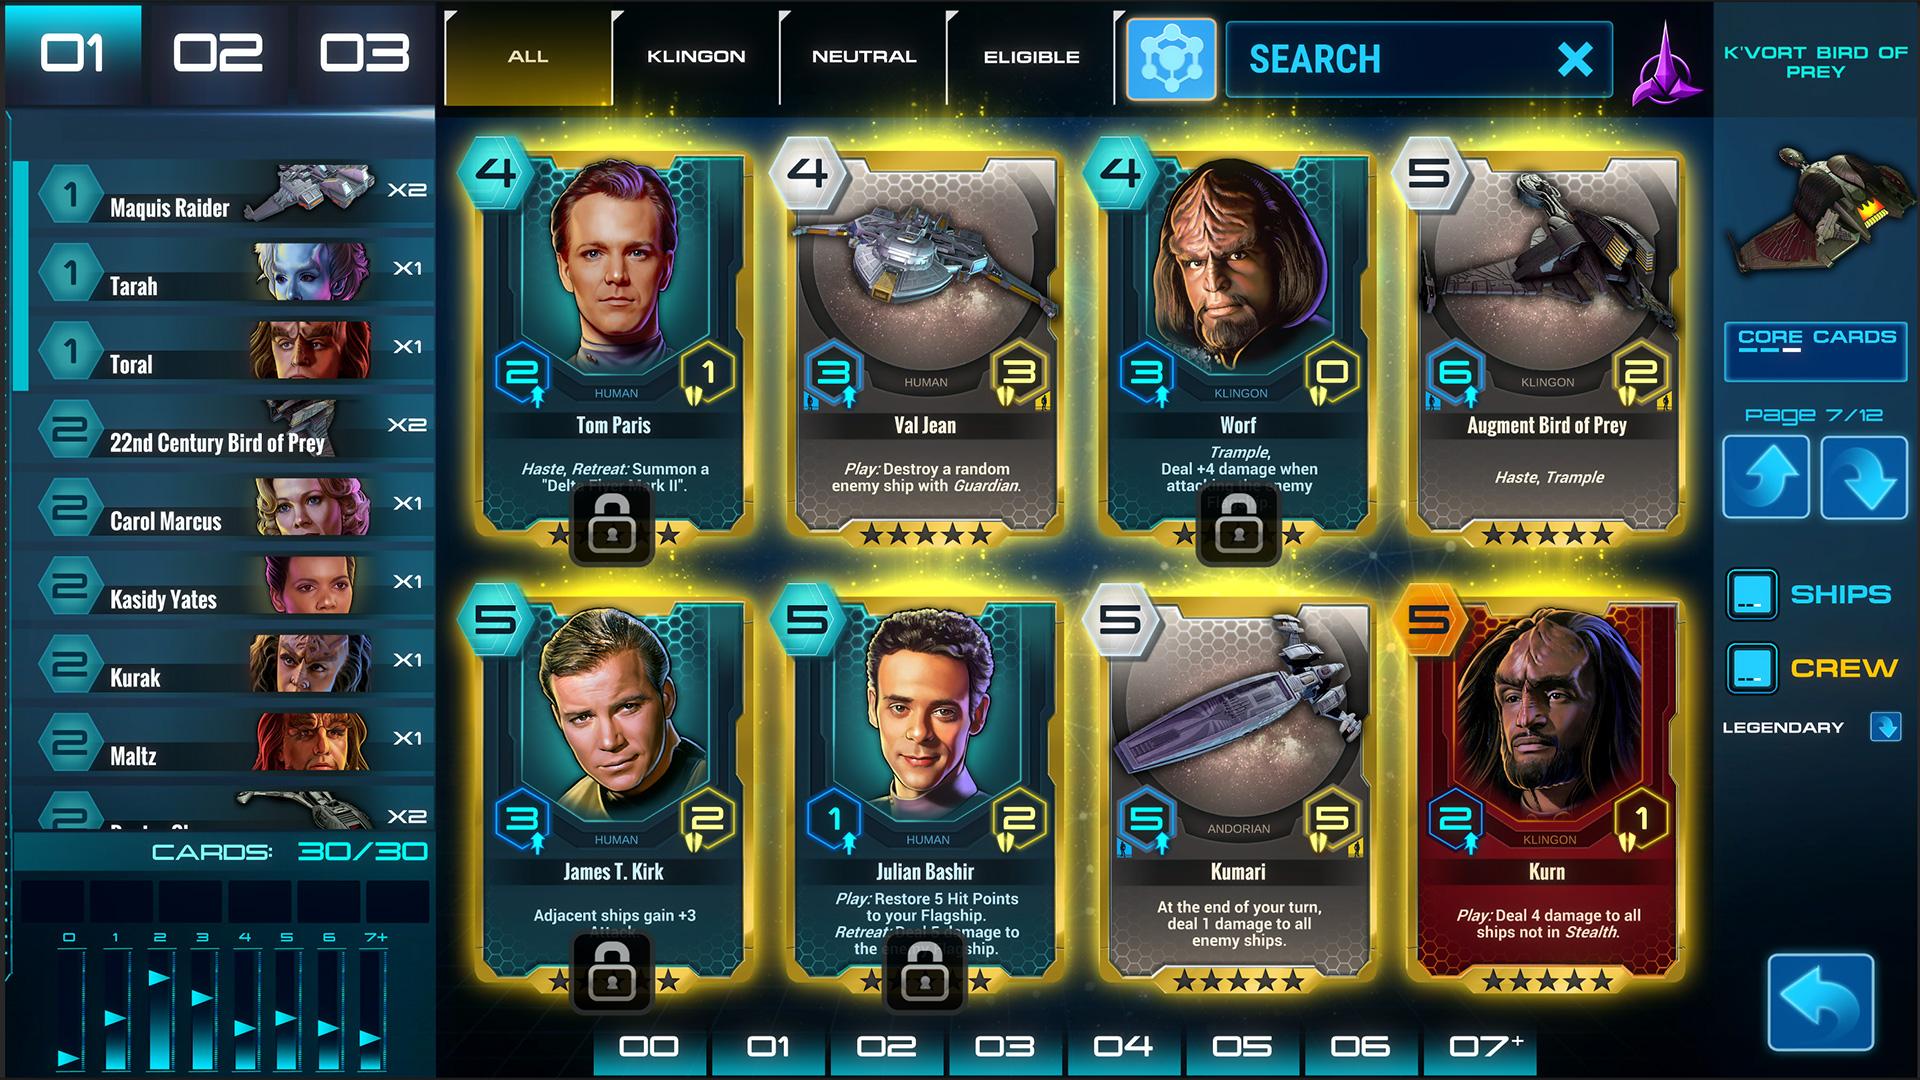 Star wars kartenspiel online dating